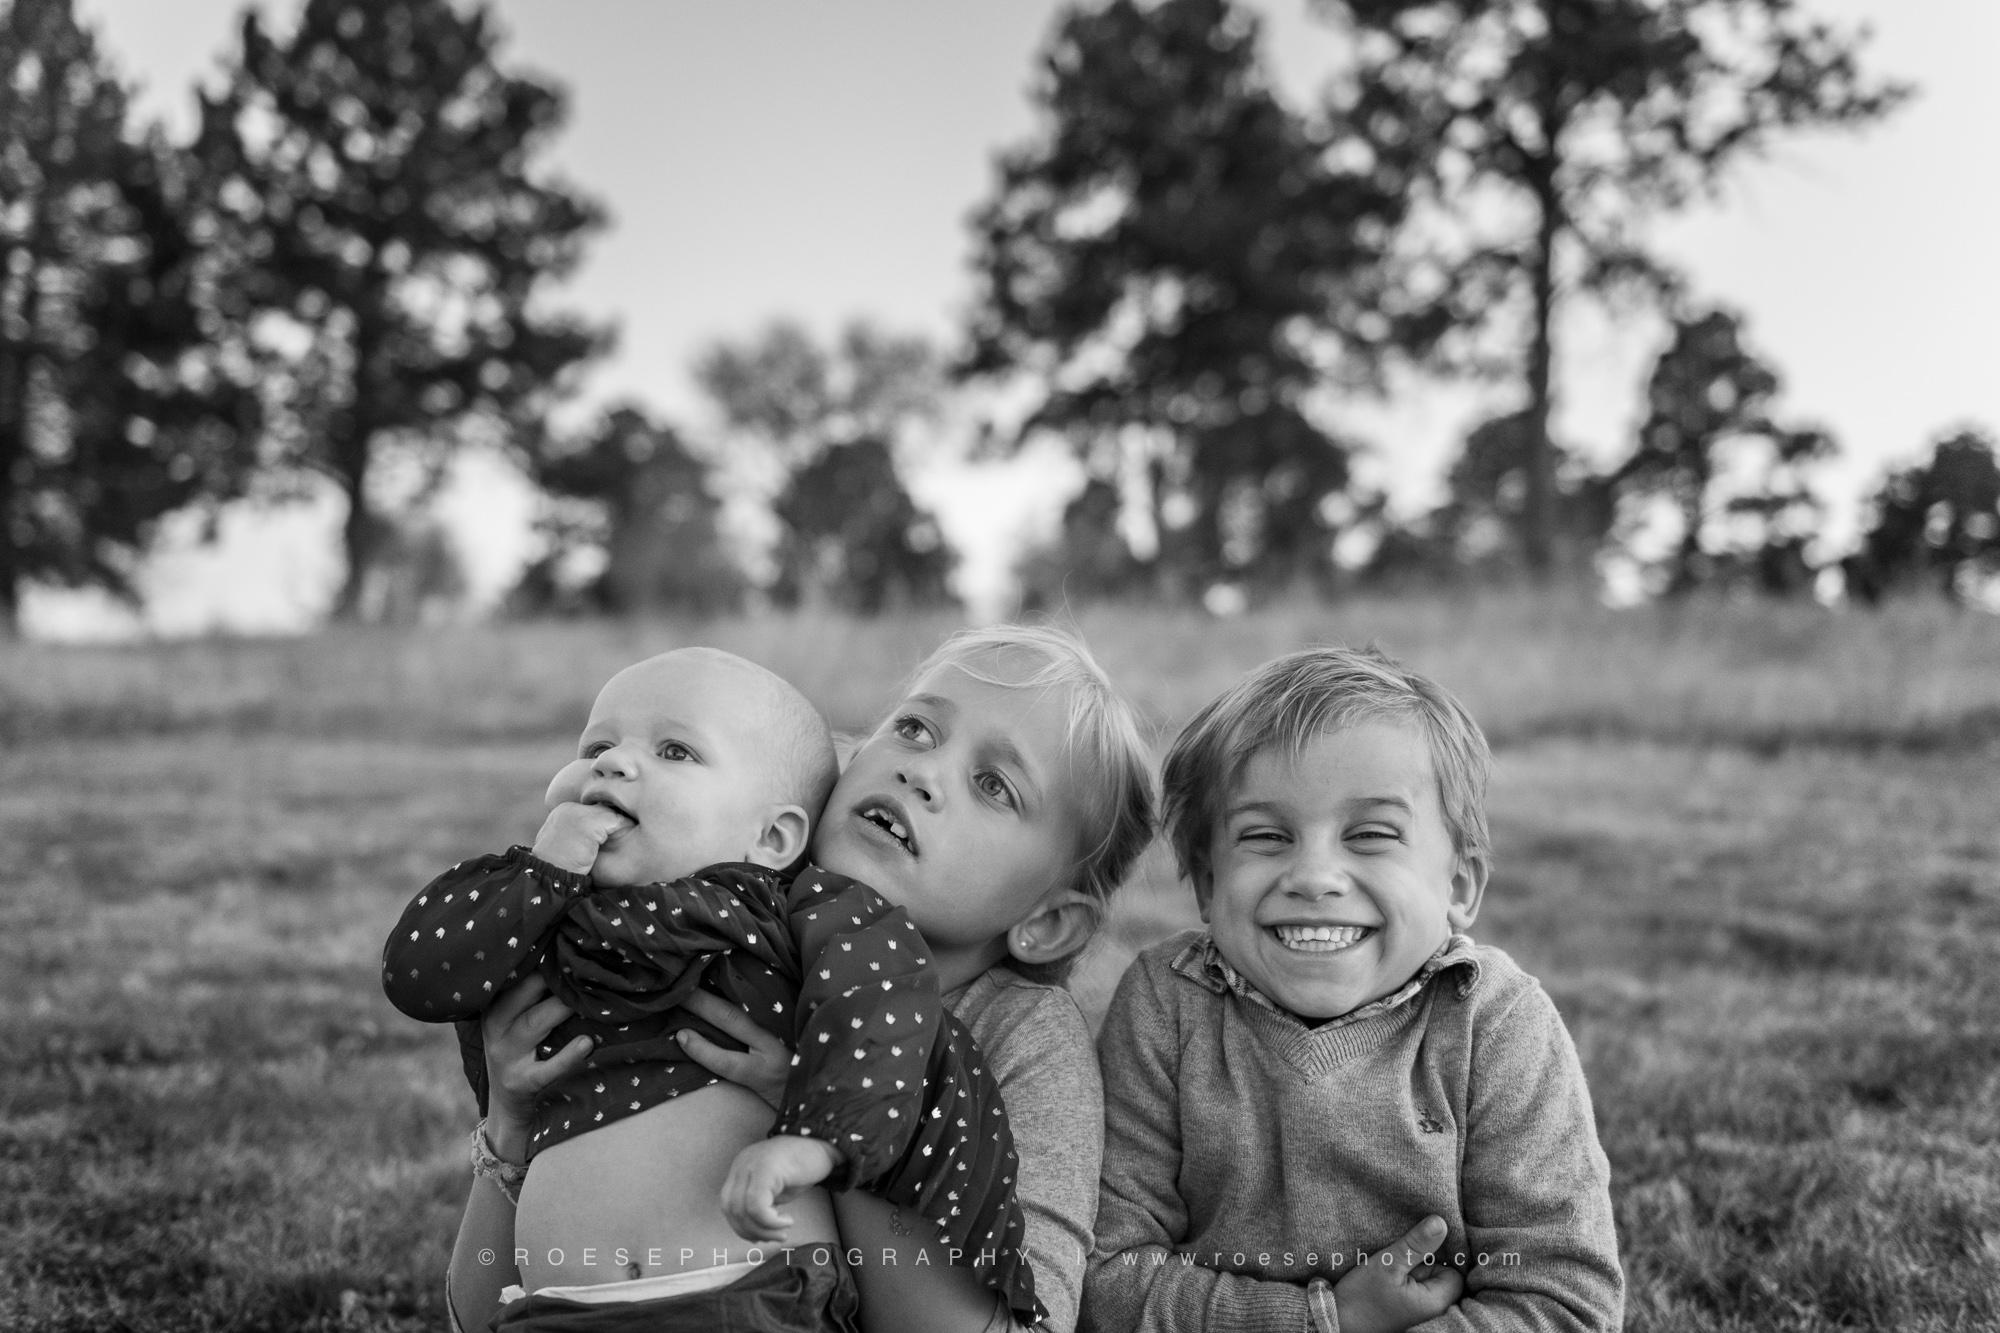 Roese_Photography.Pedersen-20.jpg